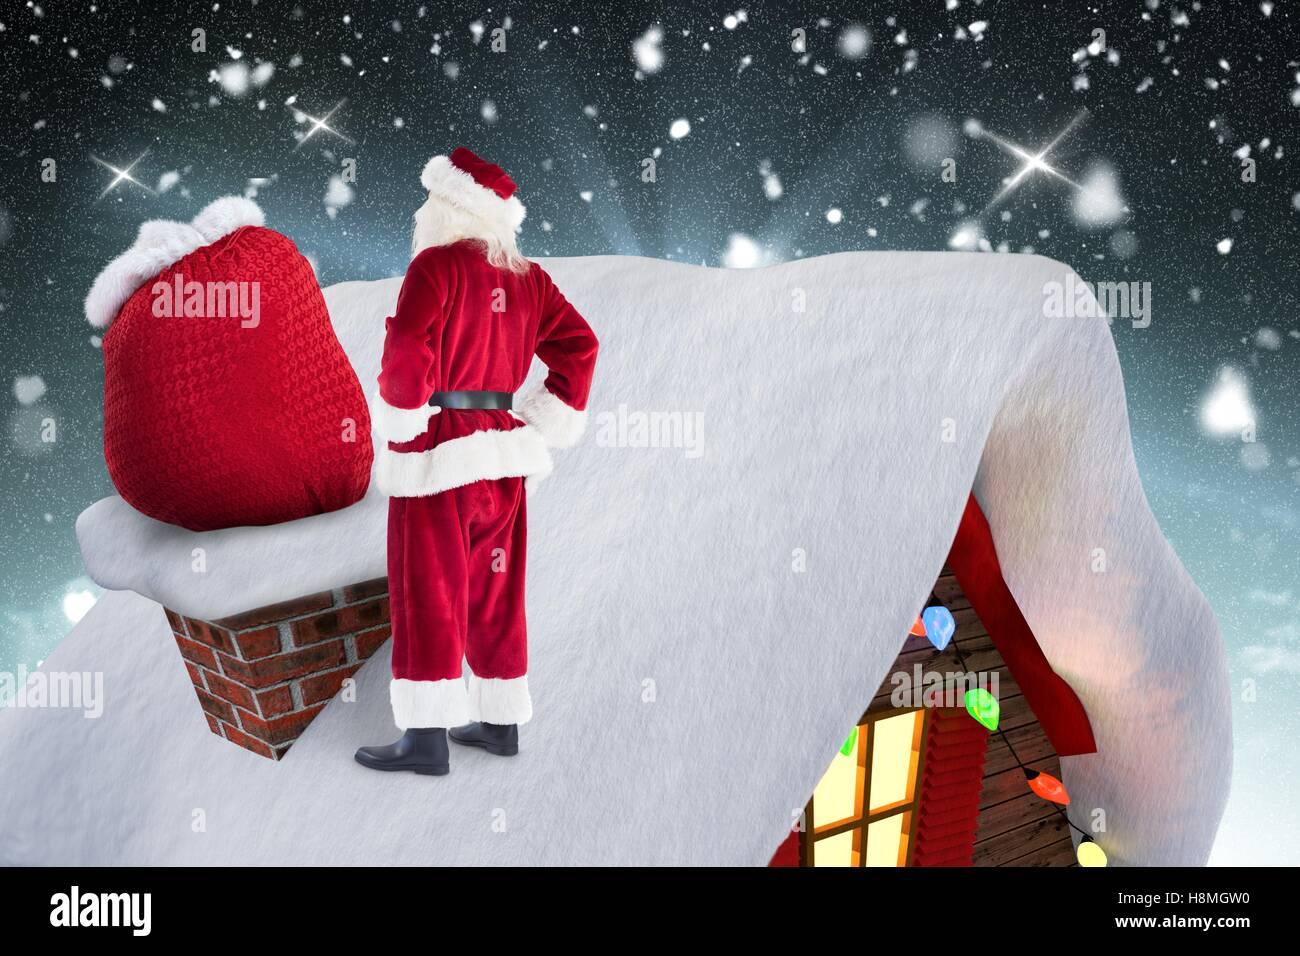 Isolated santa claus drinking milk christmas tree ornament stock